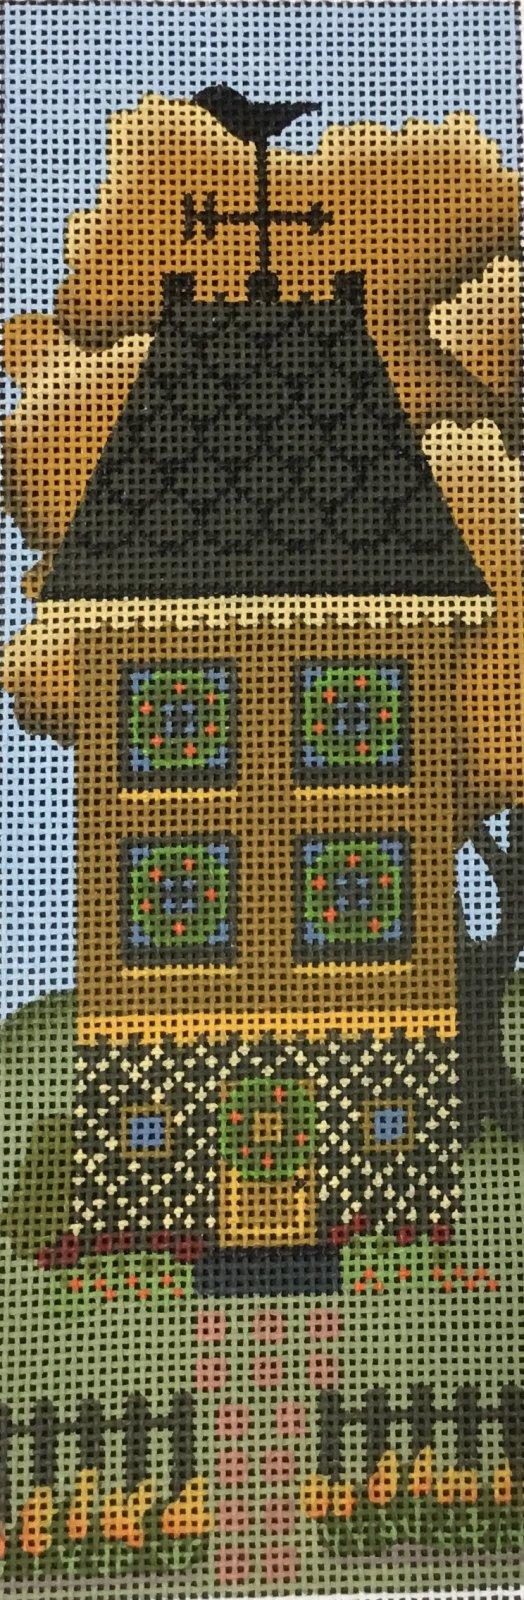 Ochre Autumn House, 18M, 8.25x2.25